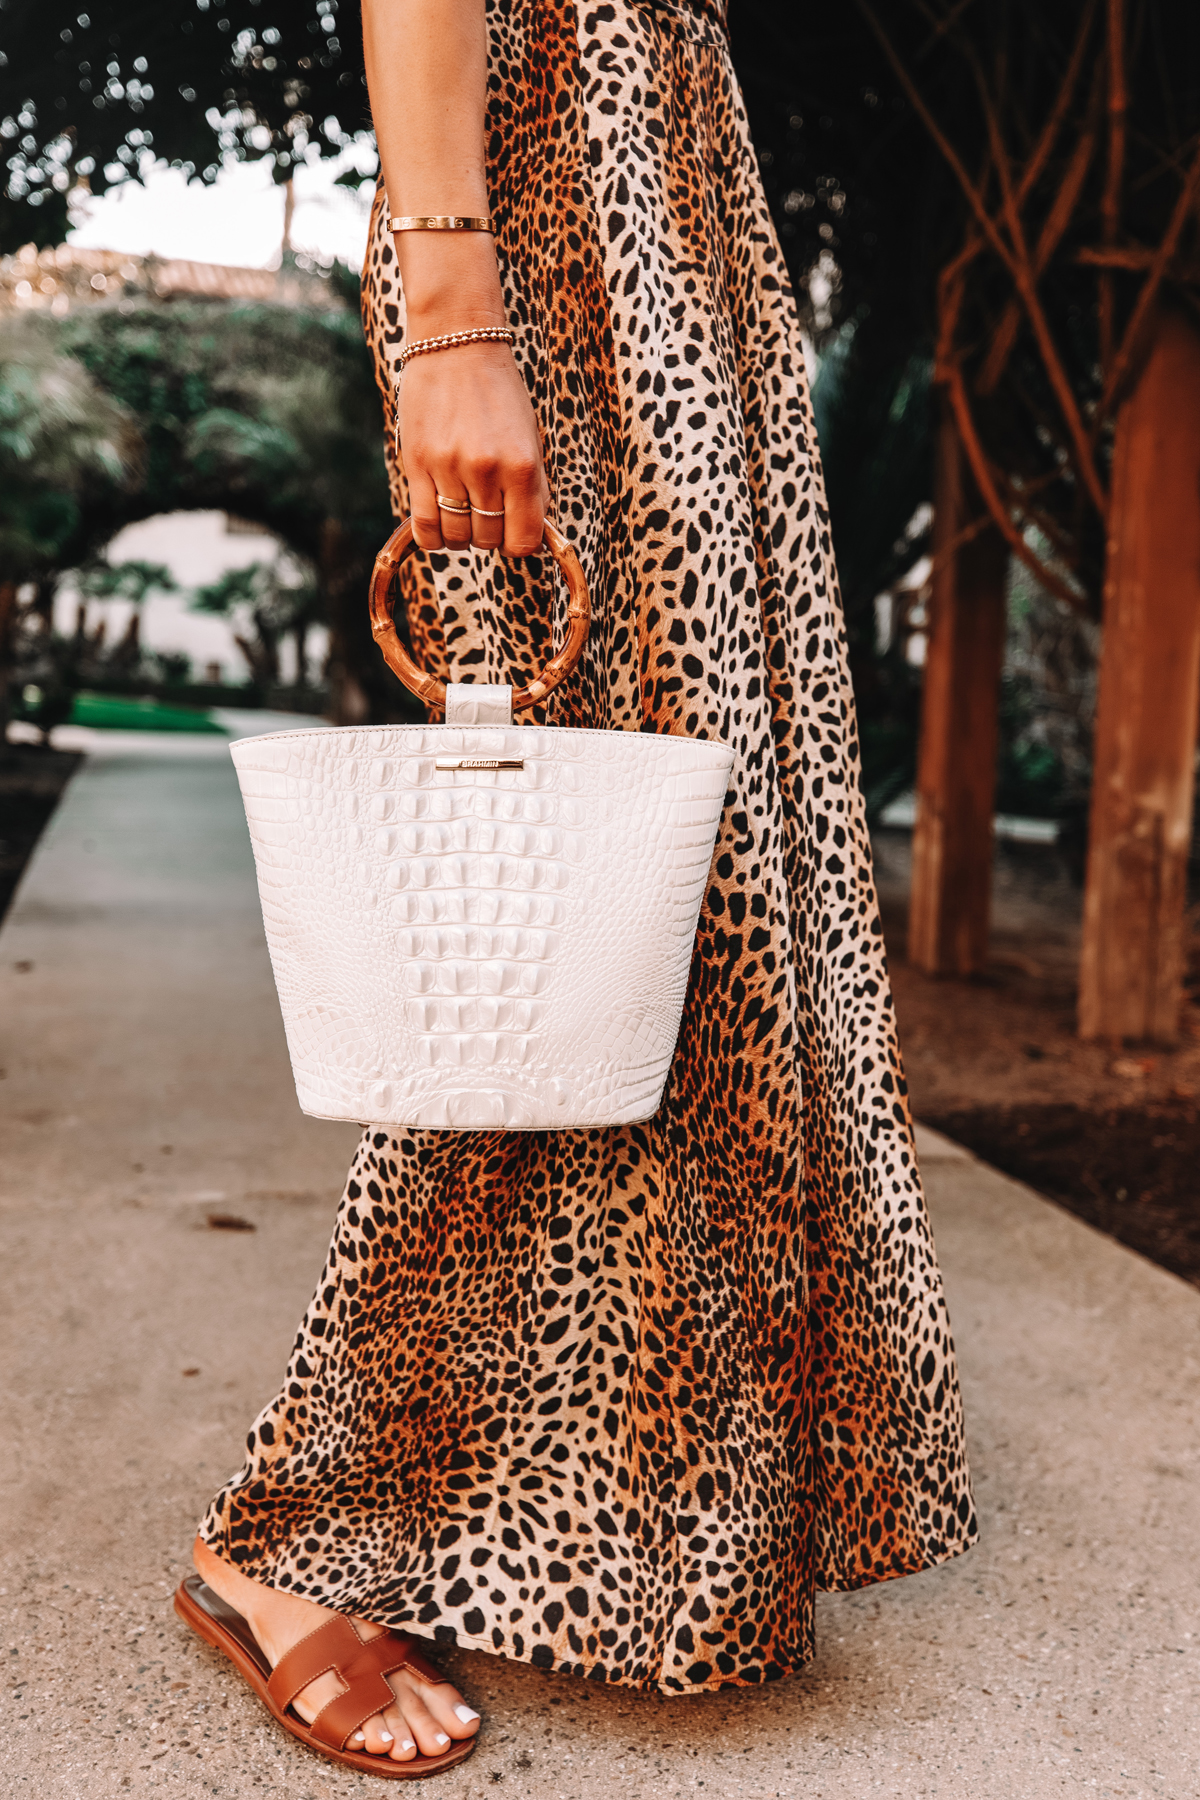 Fashion Jackson Wearing Leopard Maxi Dress Holding Brahmin Mod Bowie Handbag in White Hermes Oran Sandals Brown